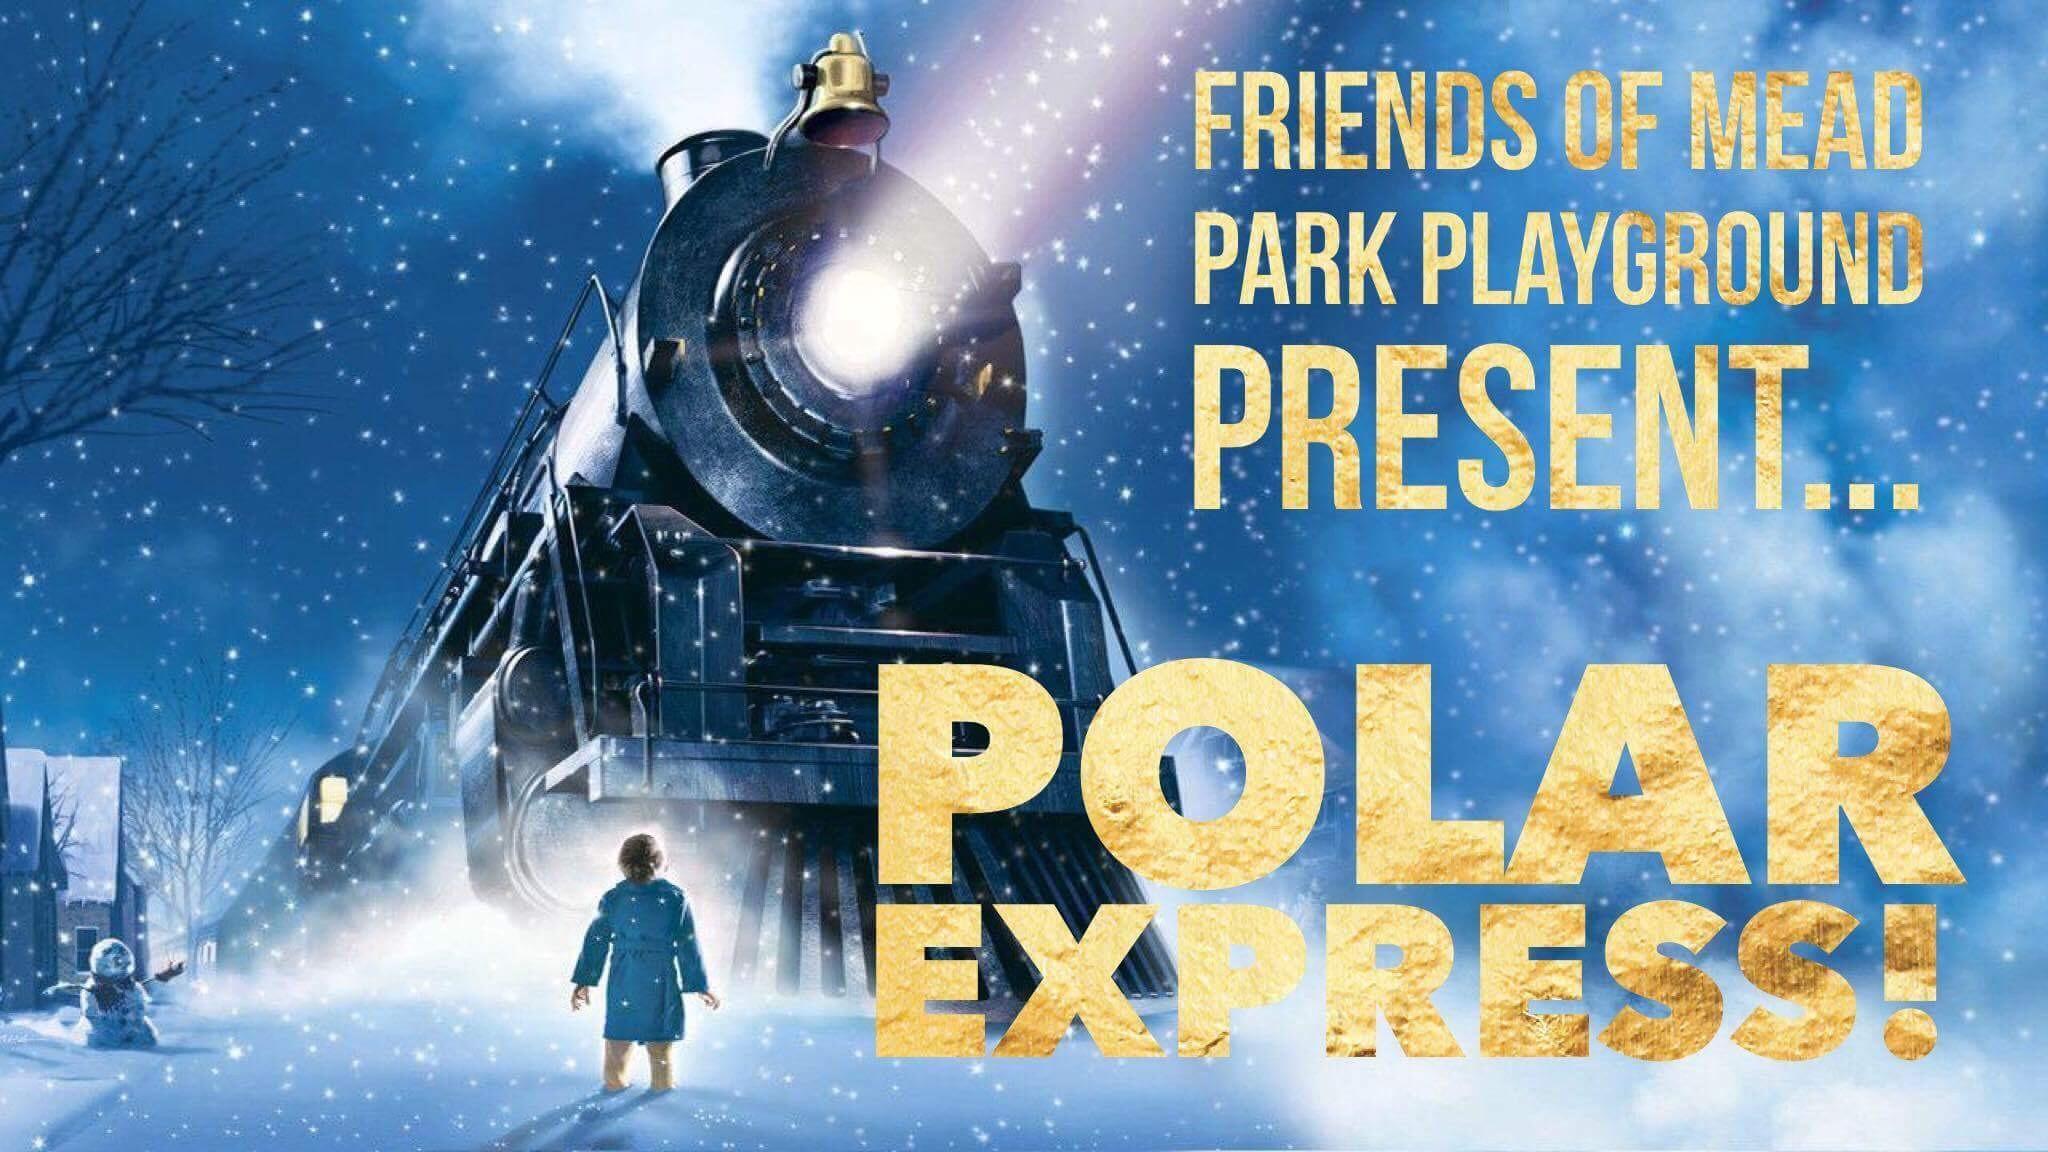 Polar Express Wallpaper 72 Images